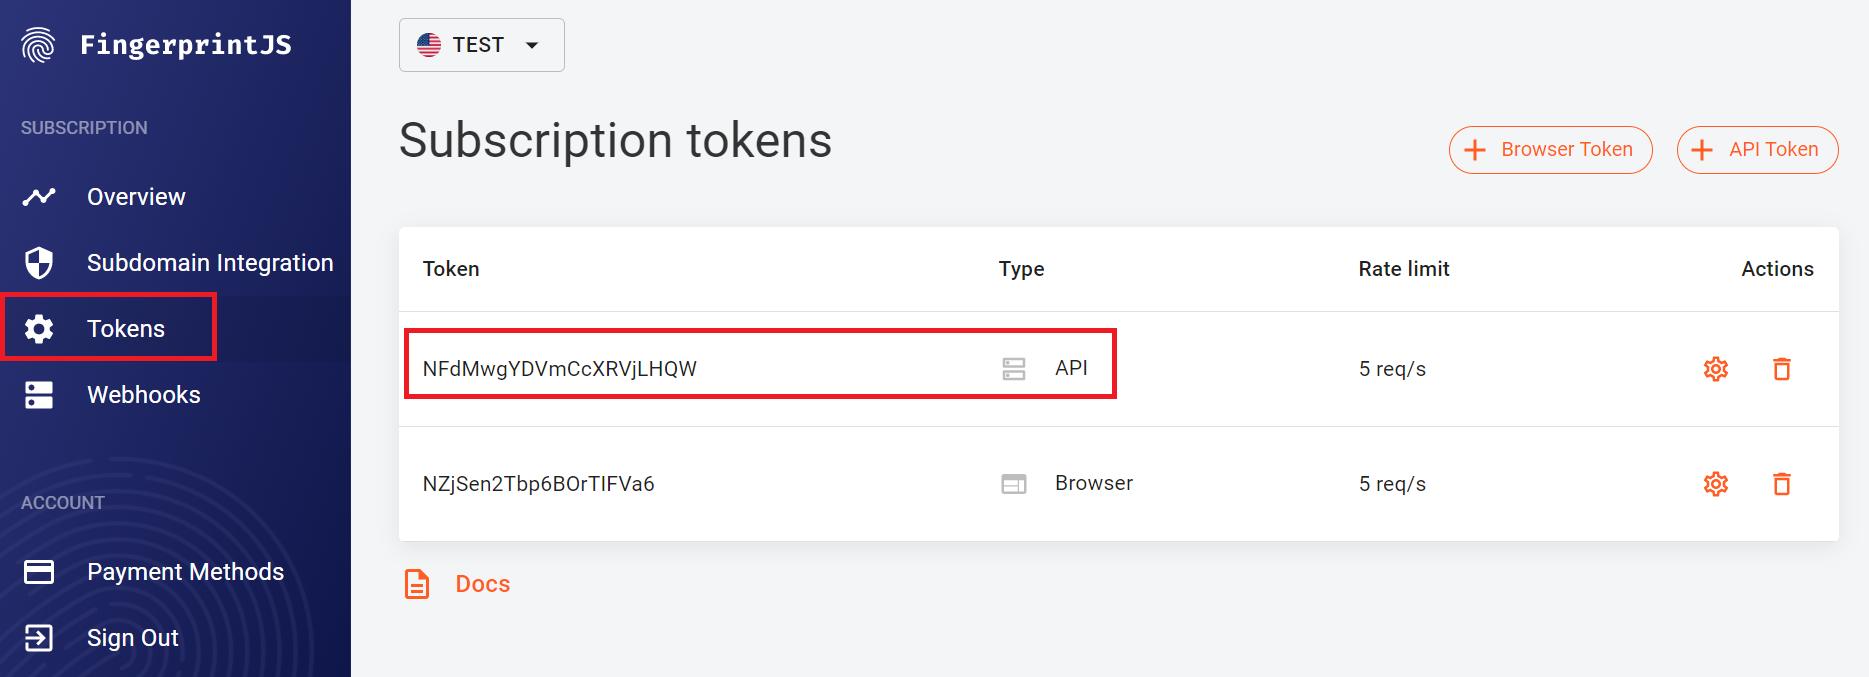 Screenshot of subscription tokens in the FingerprintJS dashboard